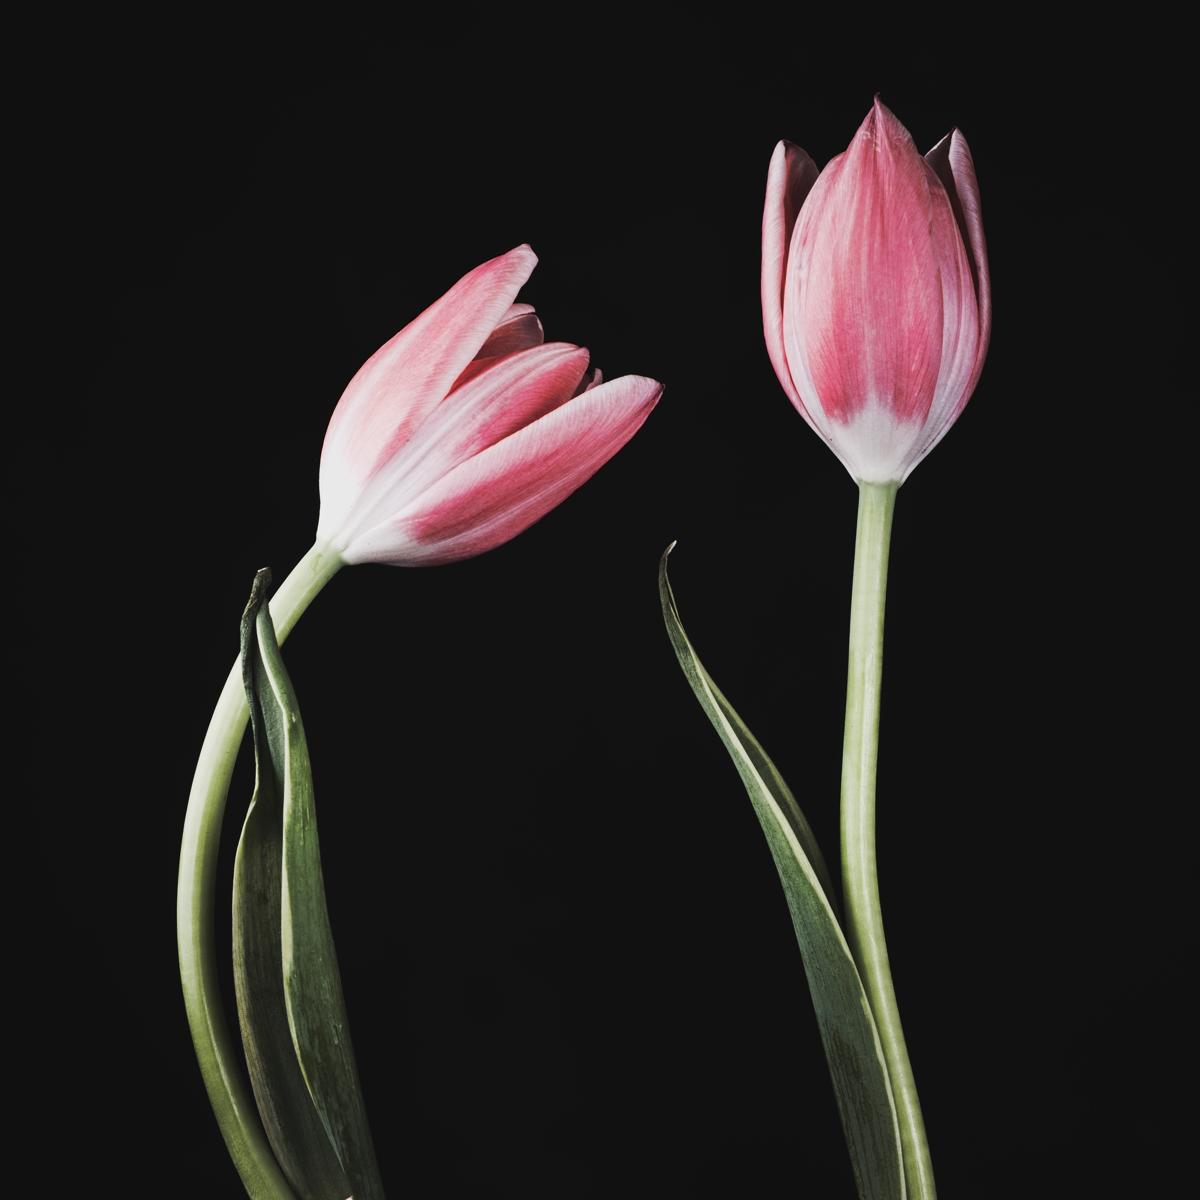 Tulip #159 (large view)